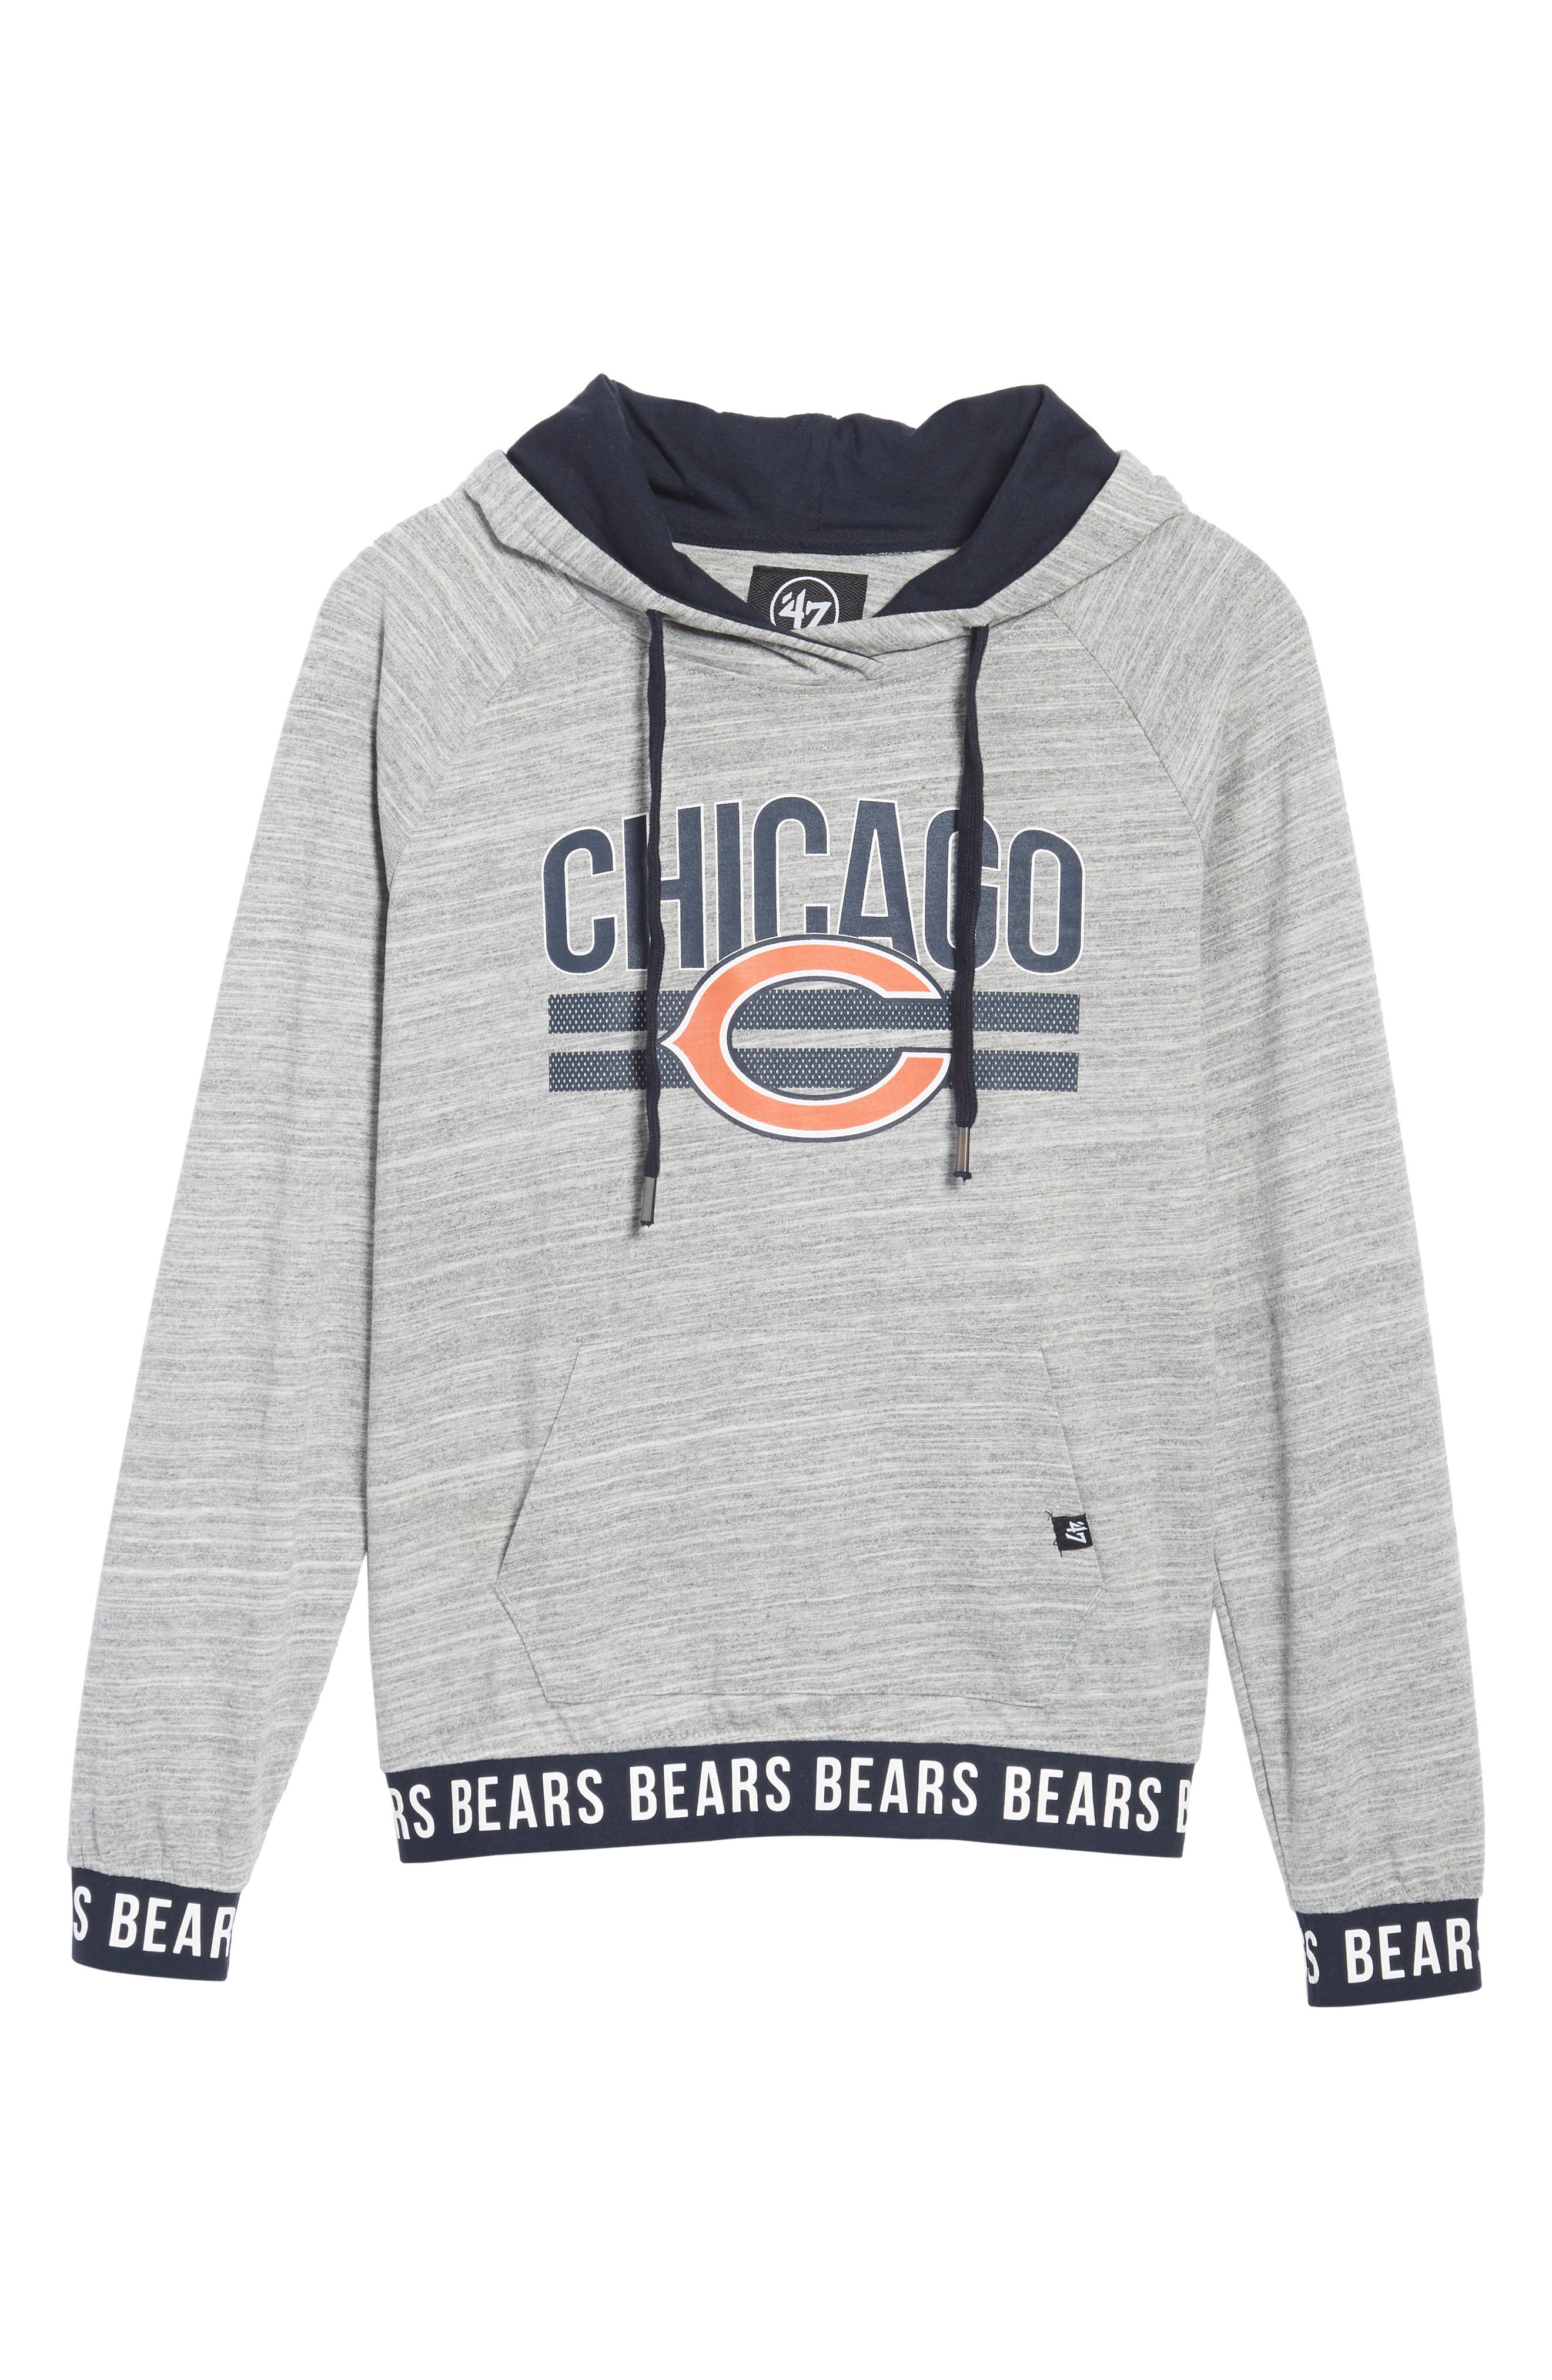 Revolve - Chicago Bears Hoodie,                             Alternate thumbnail 6, color,                             020